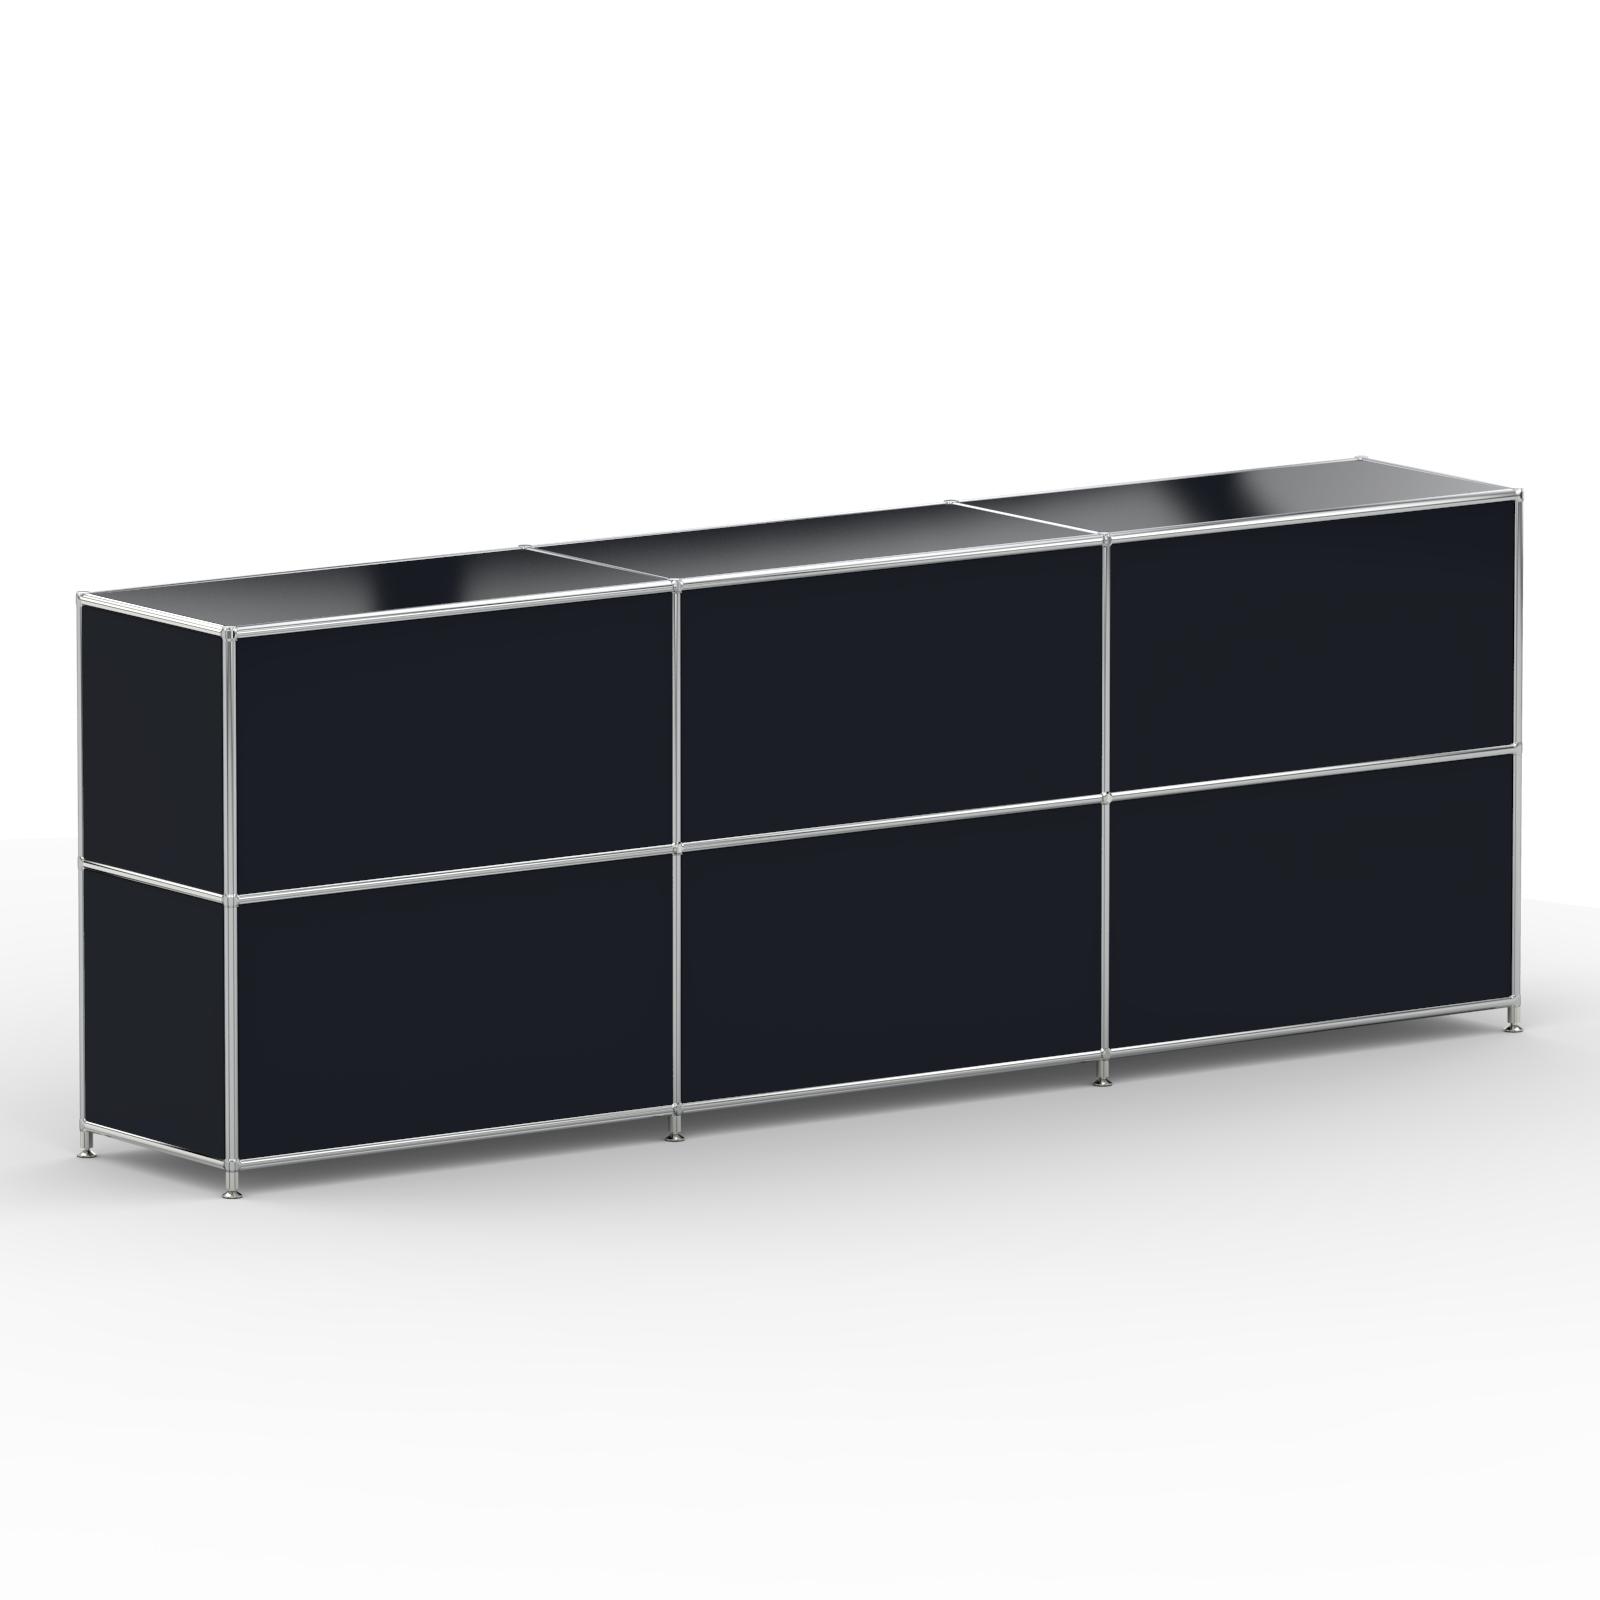 Sideboard Regal System Schrank Buroschrank Schublade Metall Chrom